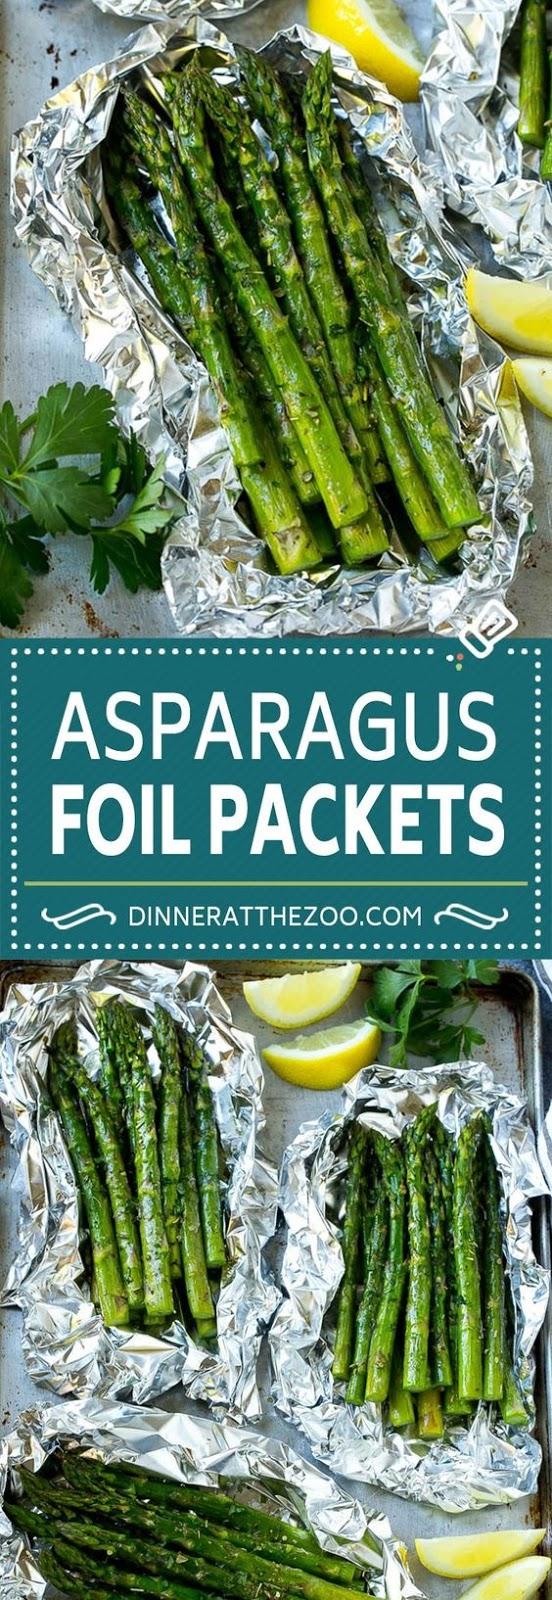 Grilled Asparagus In Foil